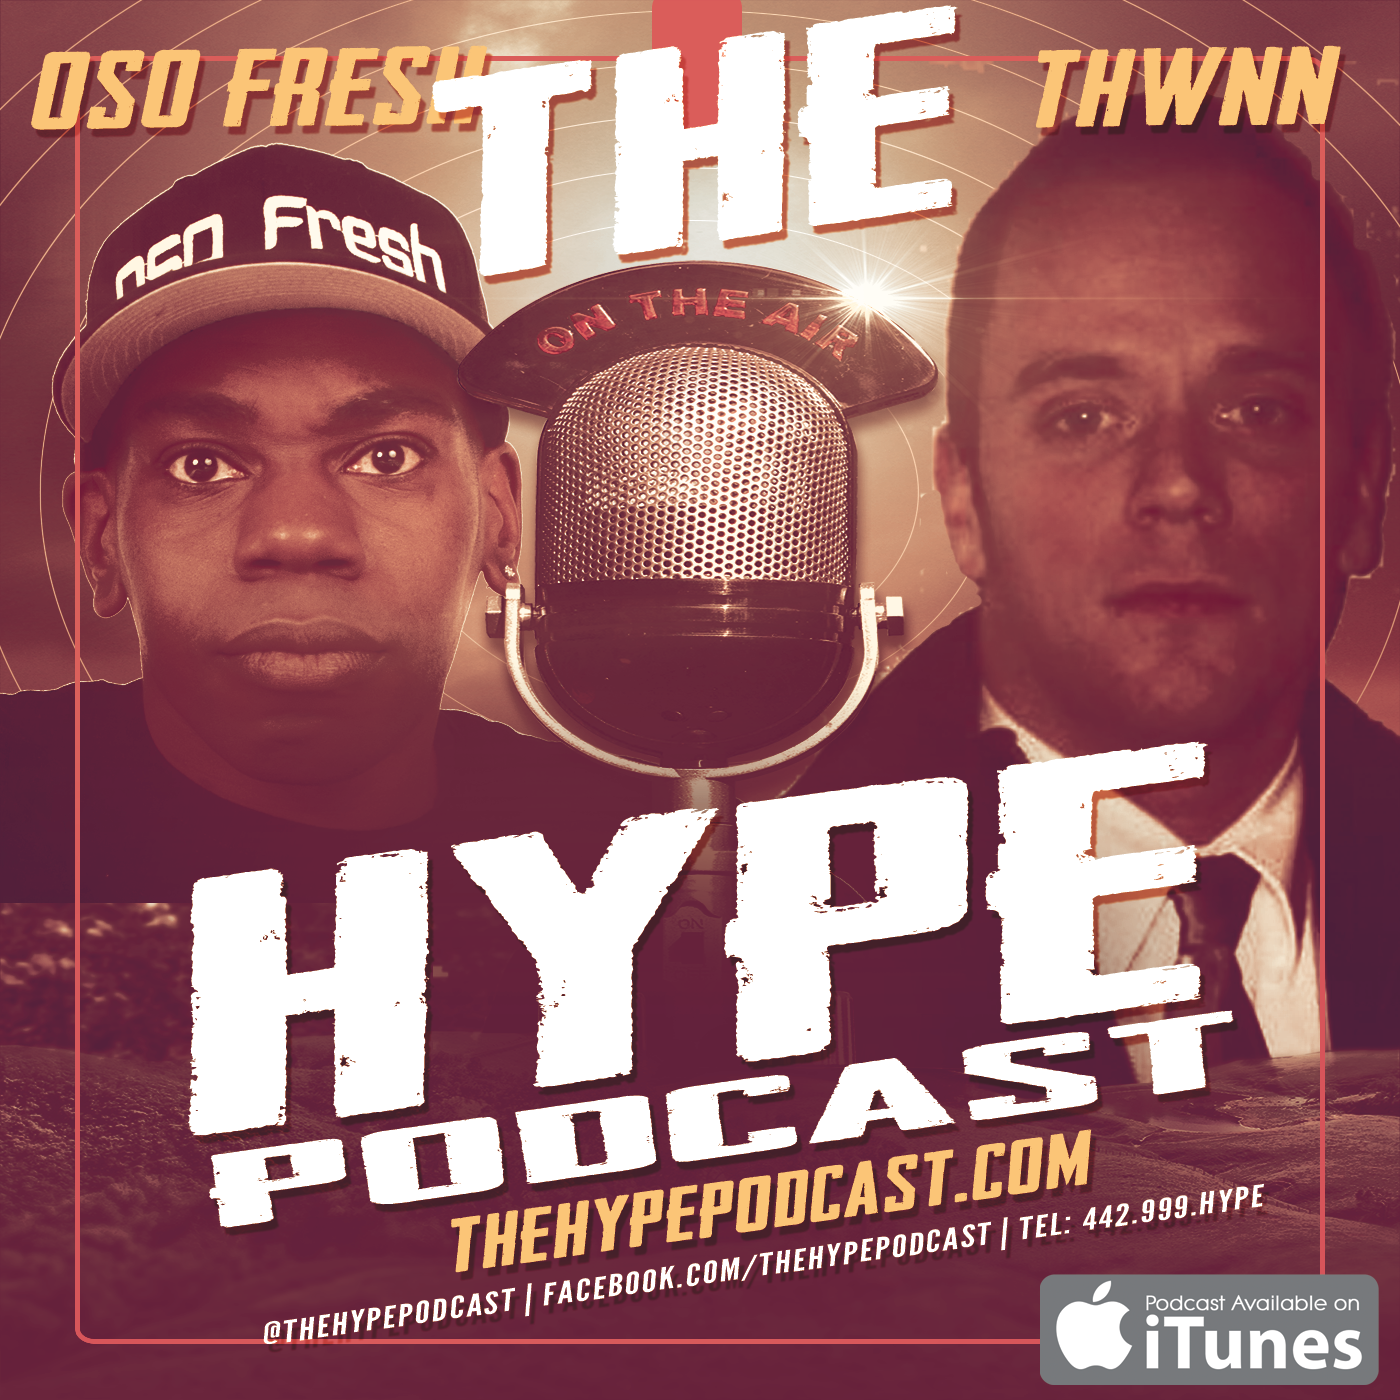 Artwork for hype podcast episode 1010